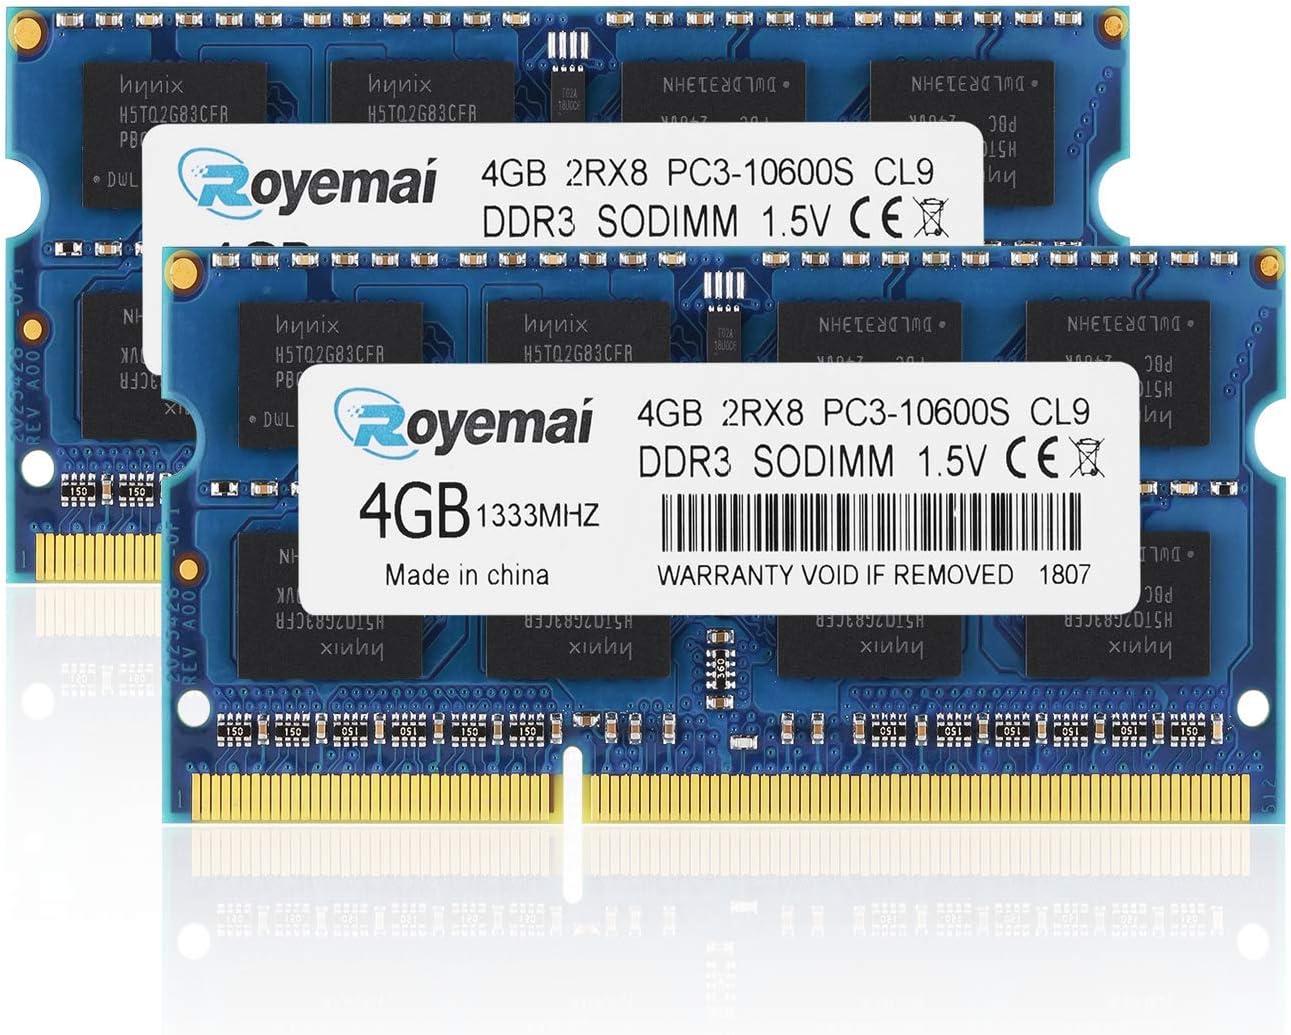 PC3-10600, DDR3 1333, ROYEMAI 8GB DDR3 Kit (2x4GB) RAM DDR3 PC3 10600S DDR3 8GB 2Rx8 204-pin 1333MHZ DDR3 1.5v 4GB DDR3 RAM Memory Upgrade for Laptop